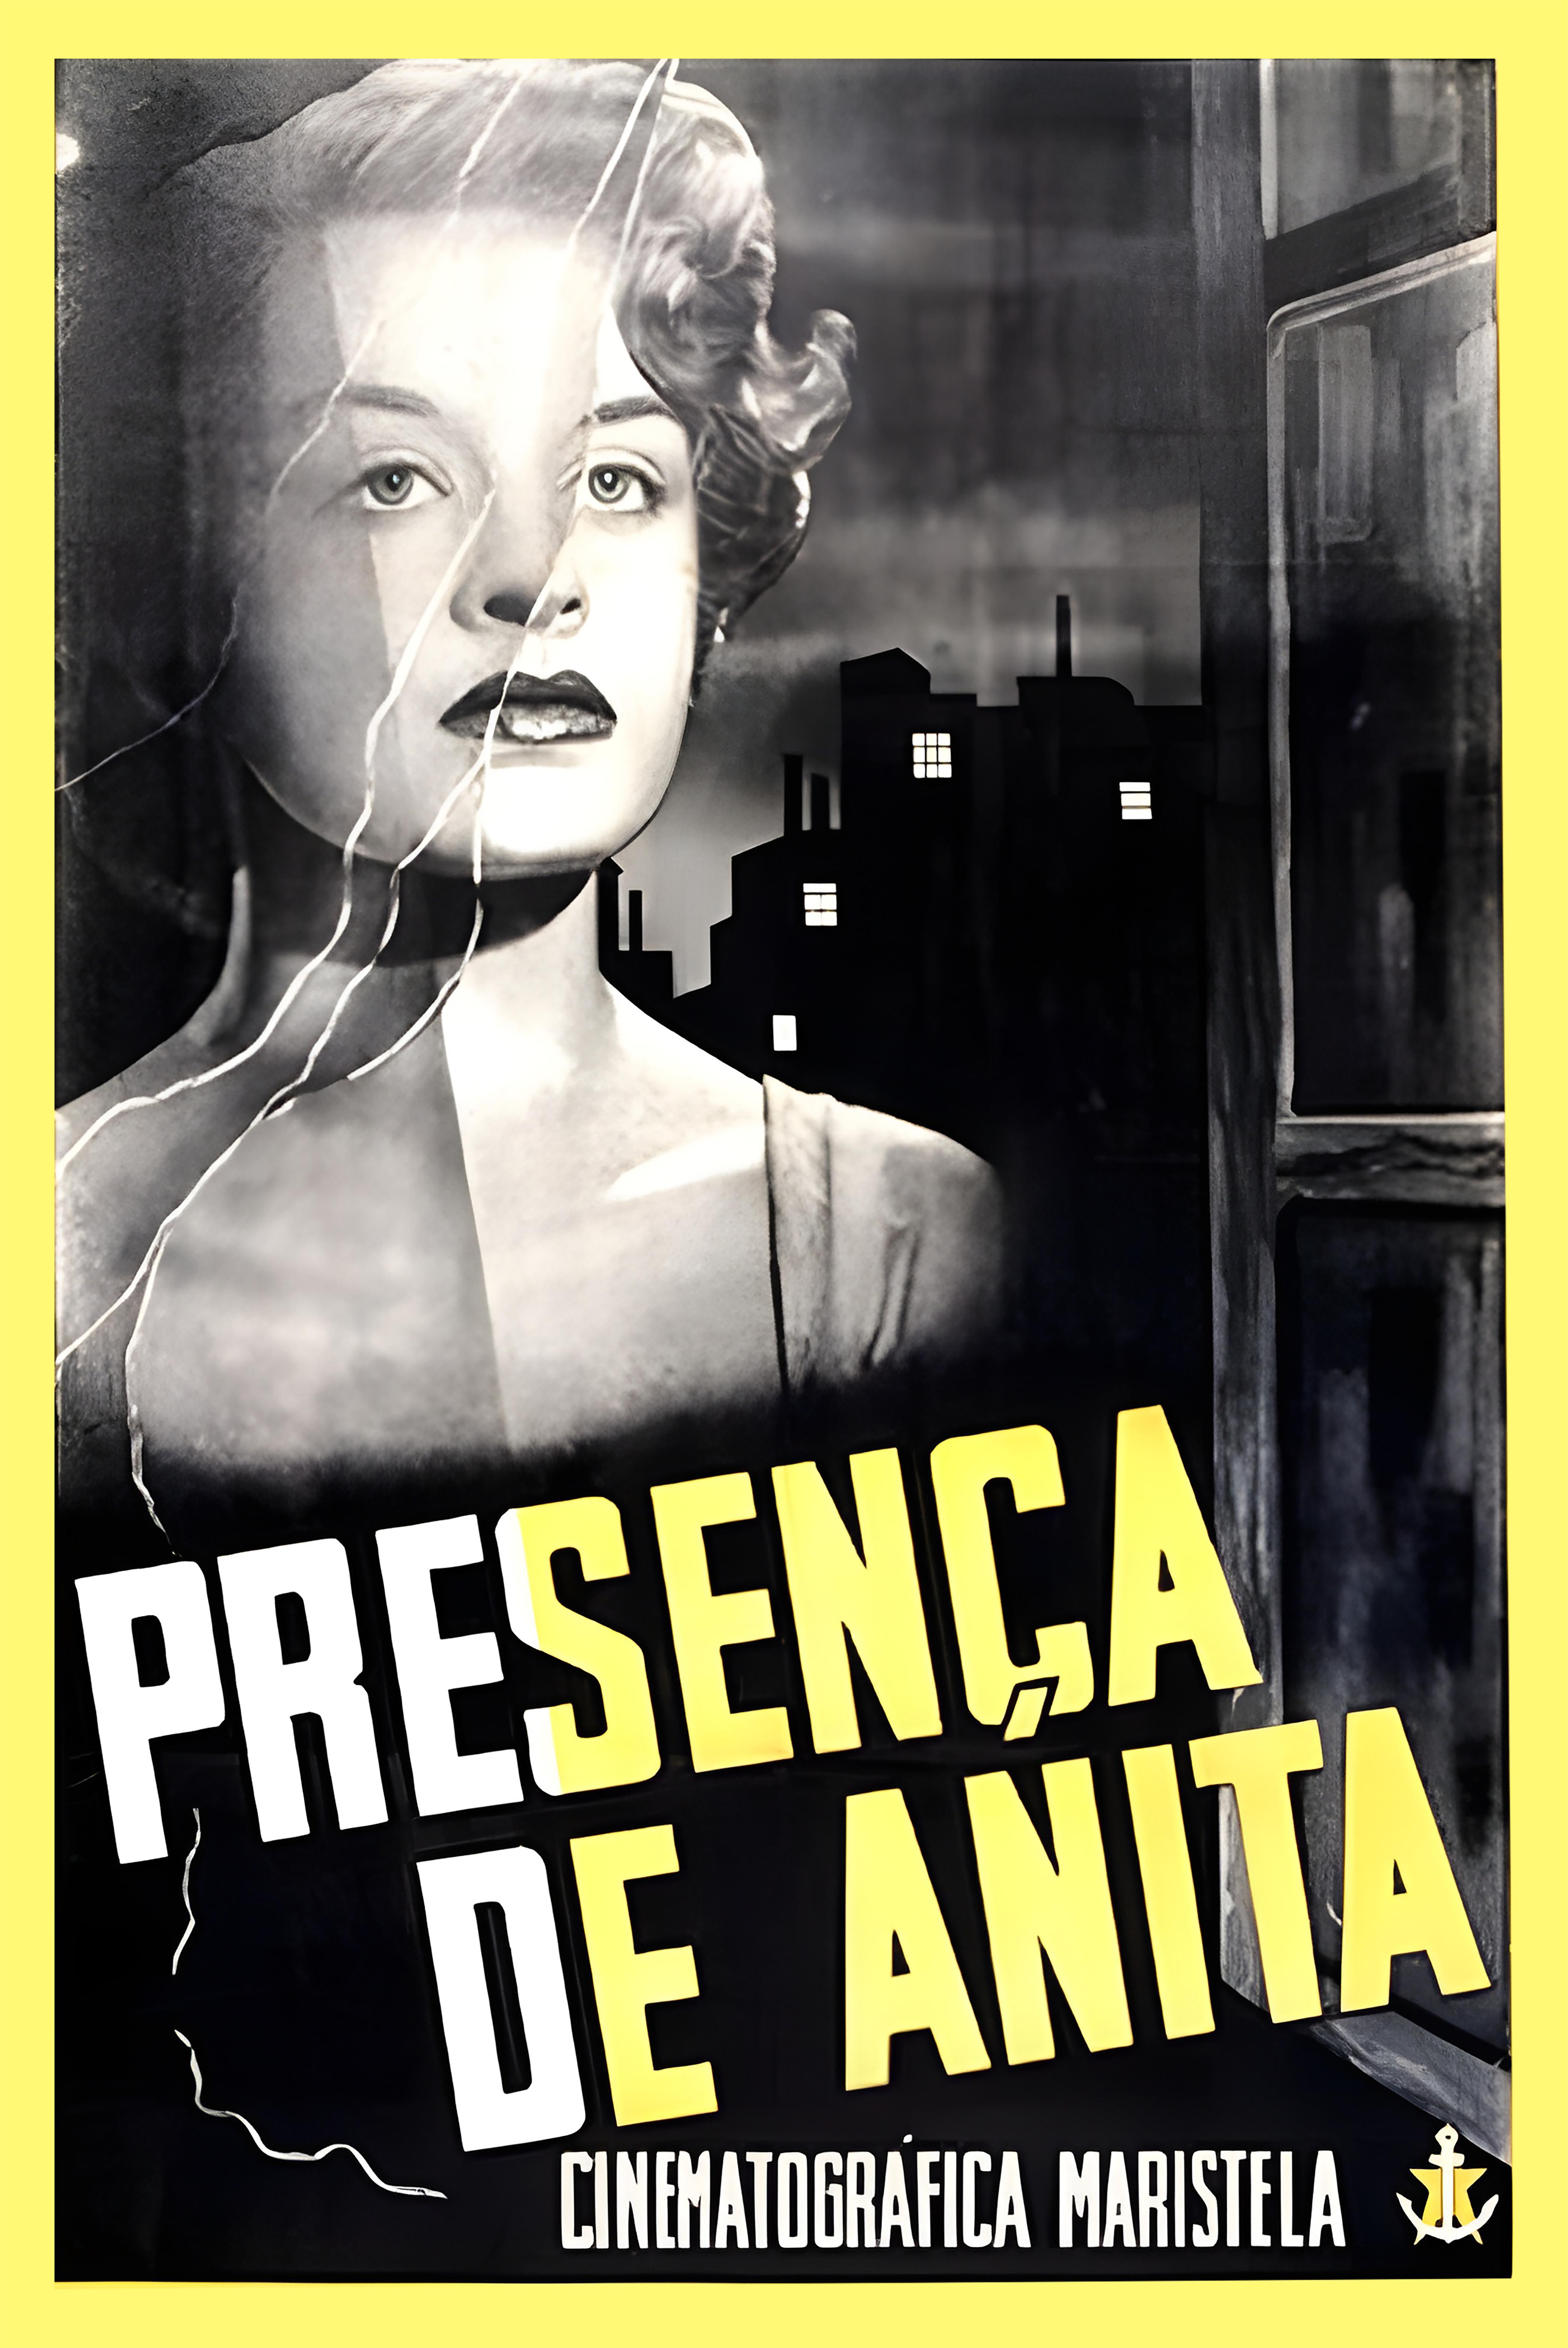 A Presença de Anita (1951)